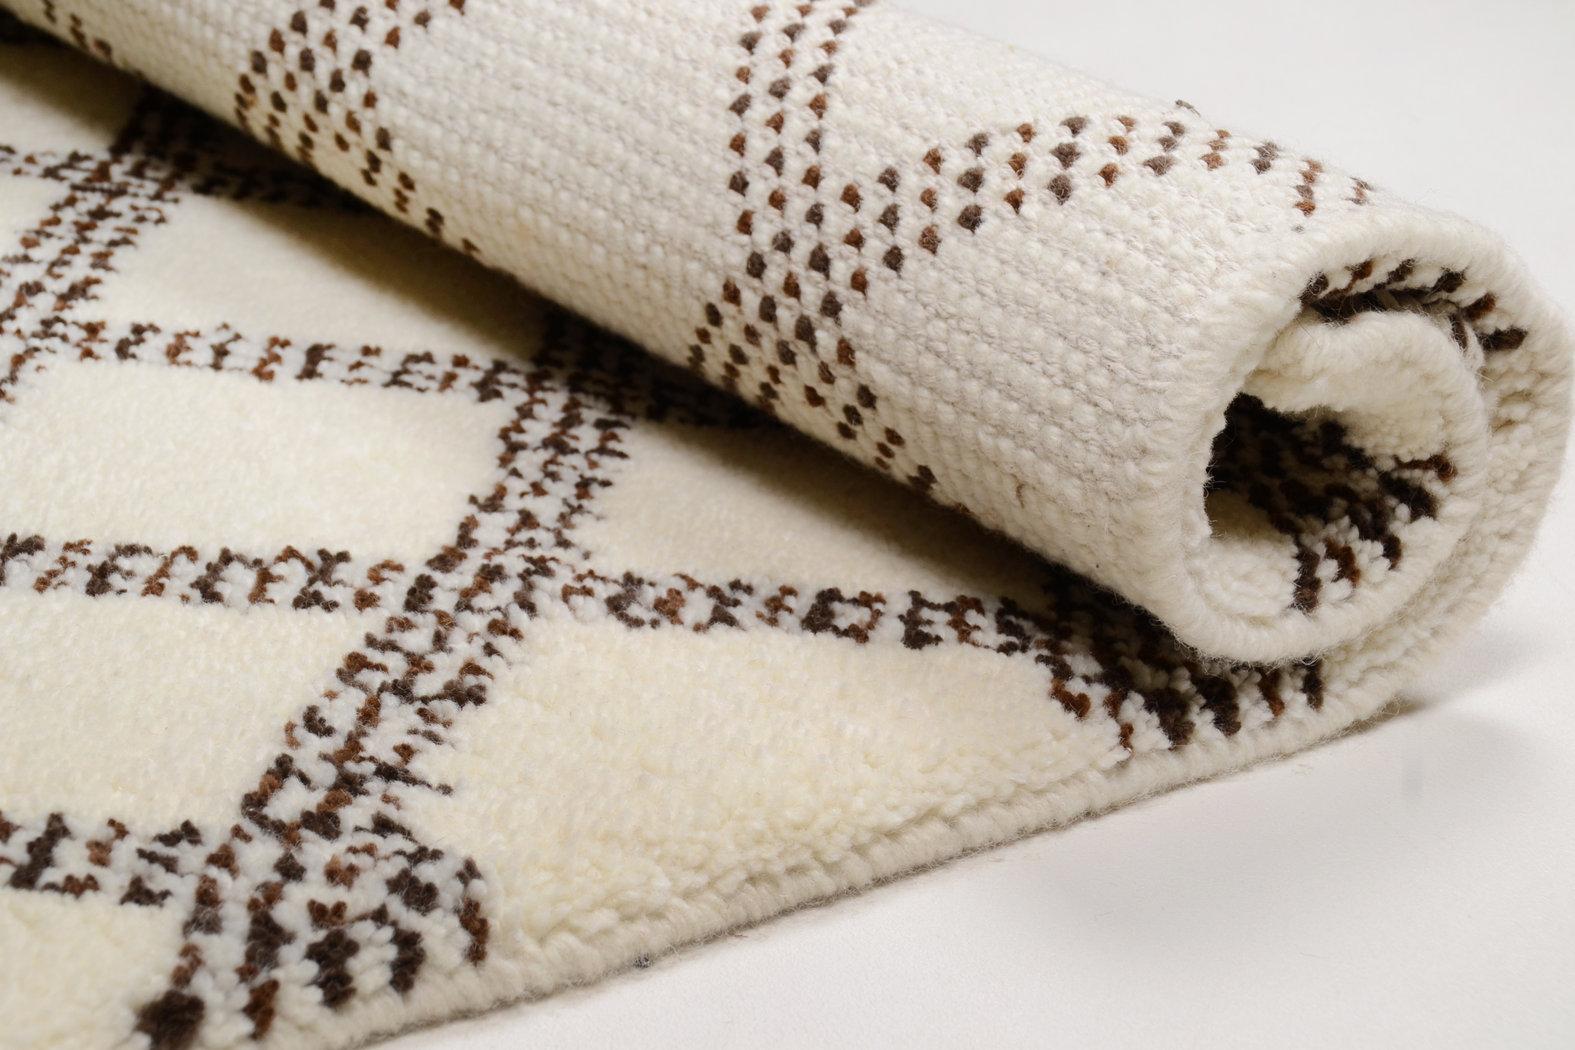 Teppich grau wei trendy teppich meliert wei grau with teppich